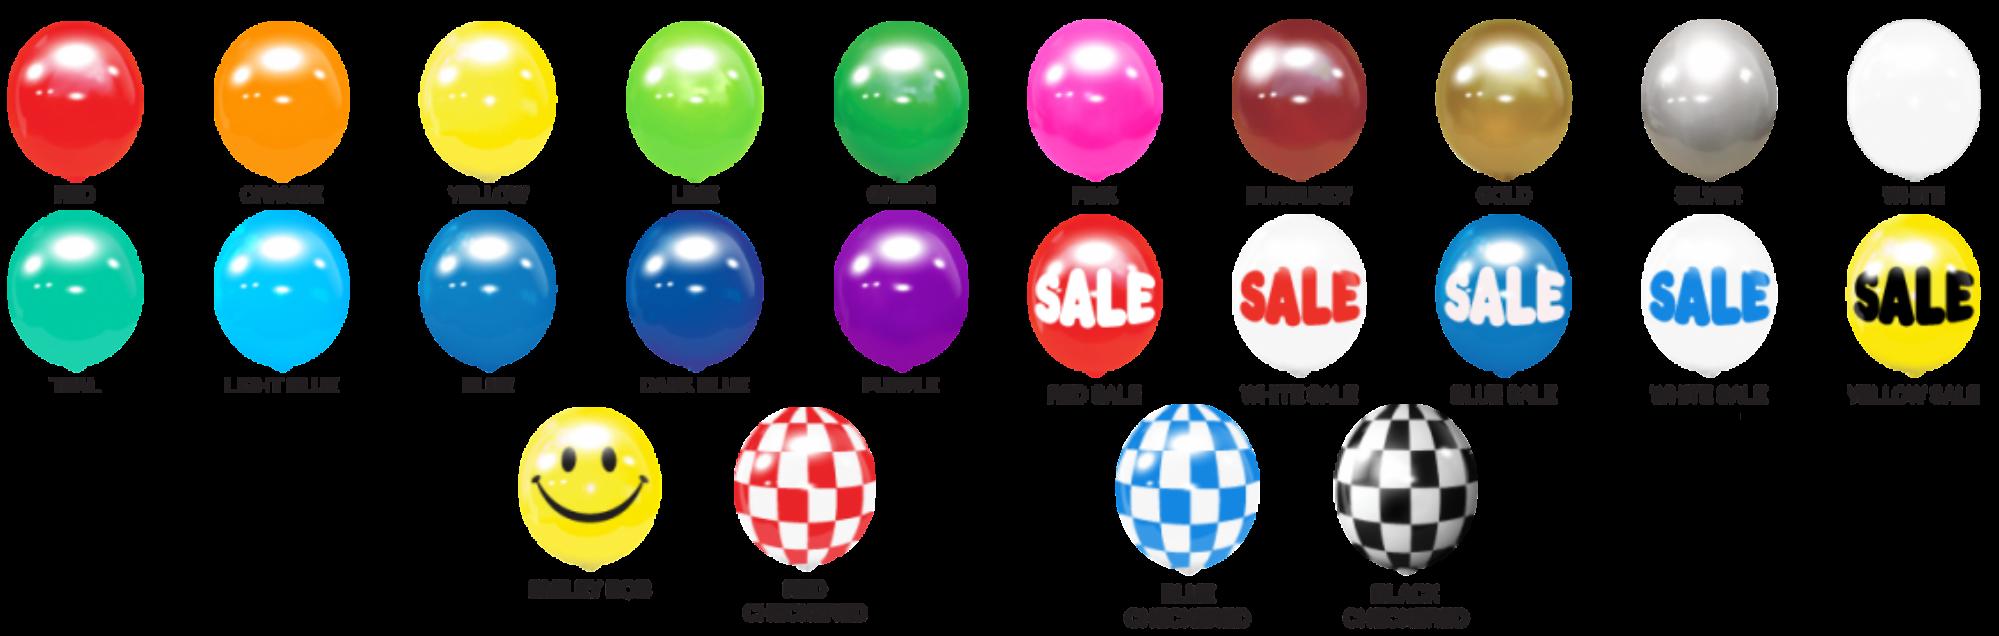 Balloontree Australia Colours